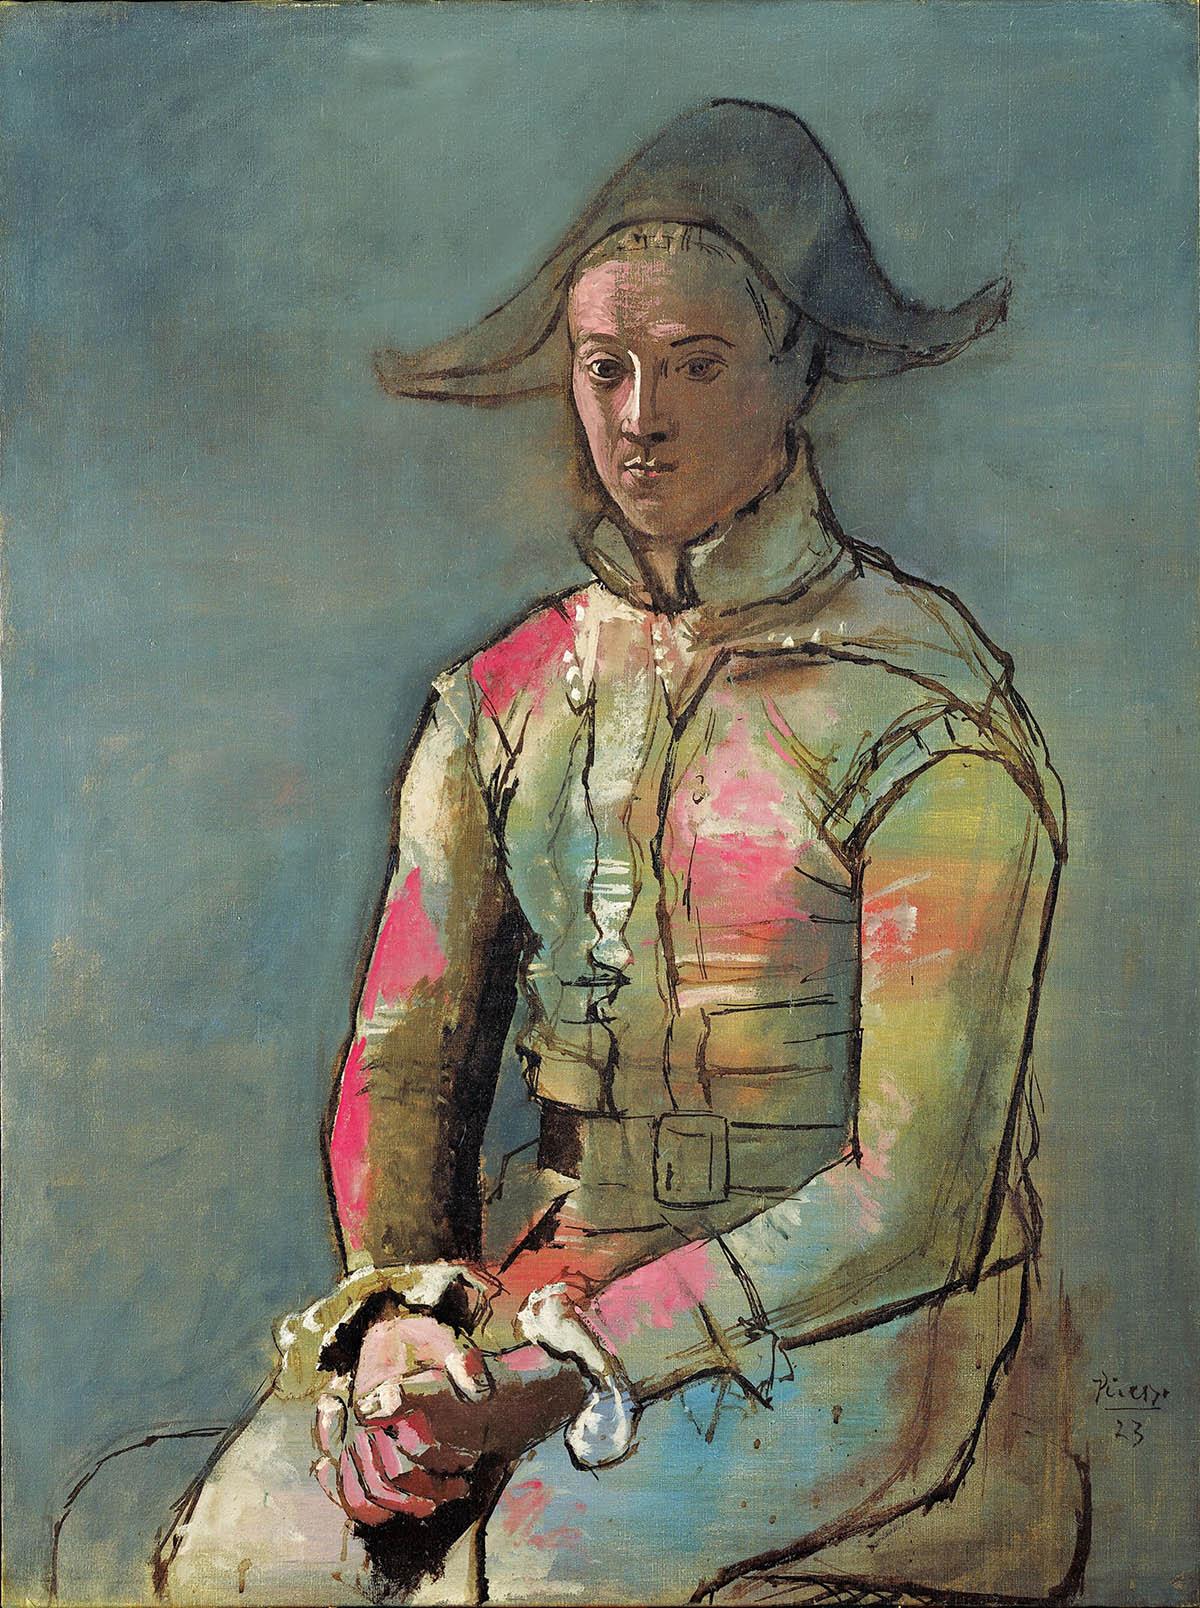 Pablo Picasso, Arlequin assis, 1923